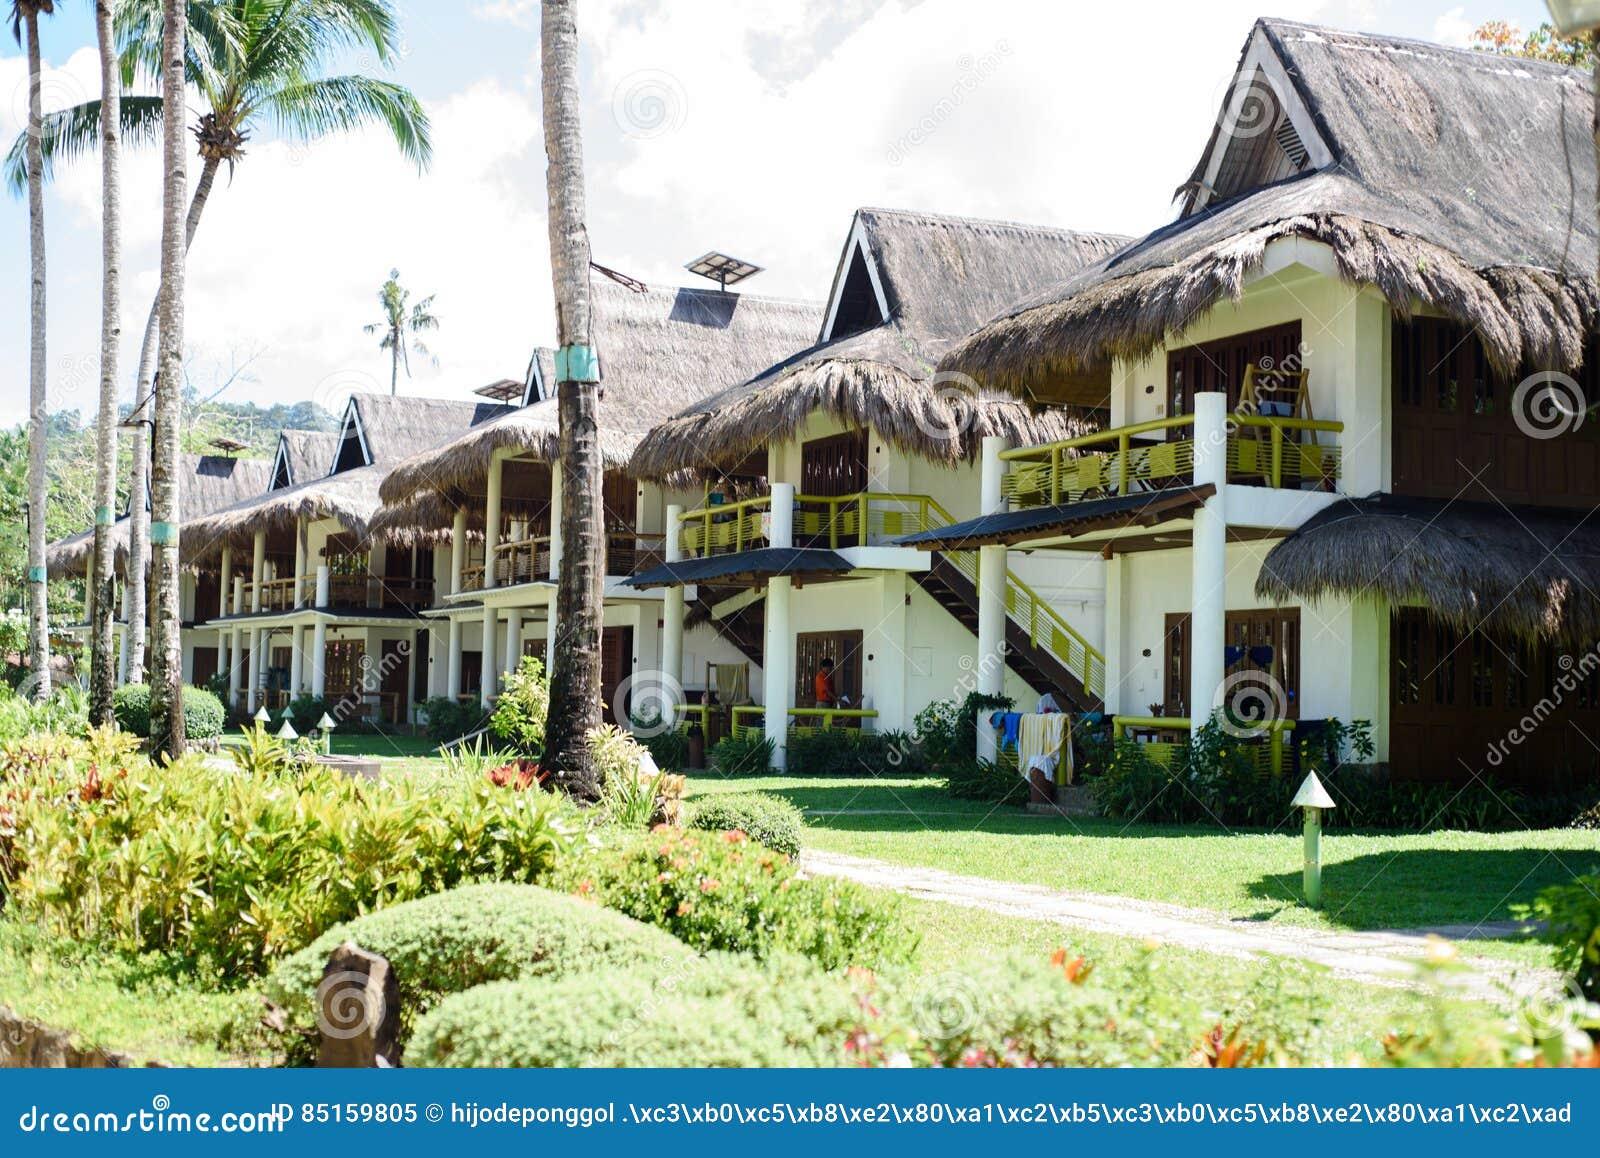 Modern Bahay Kubo As Beach House Stock Image Image Of